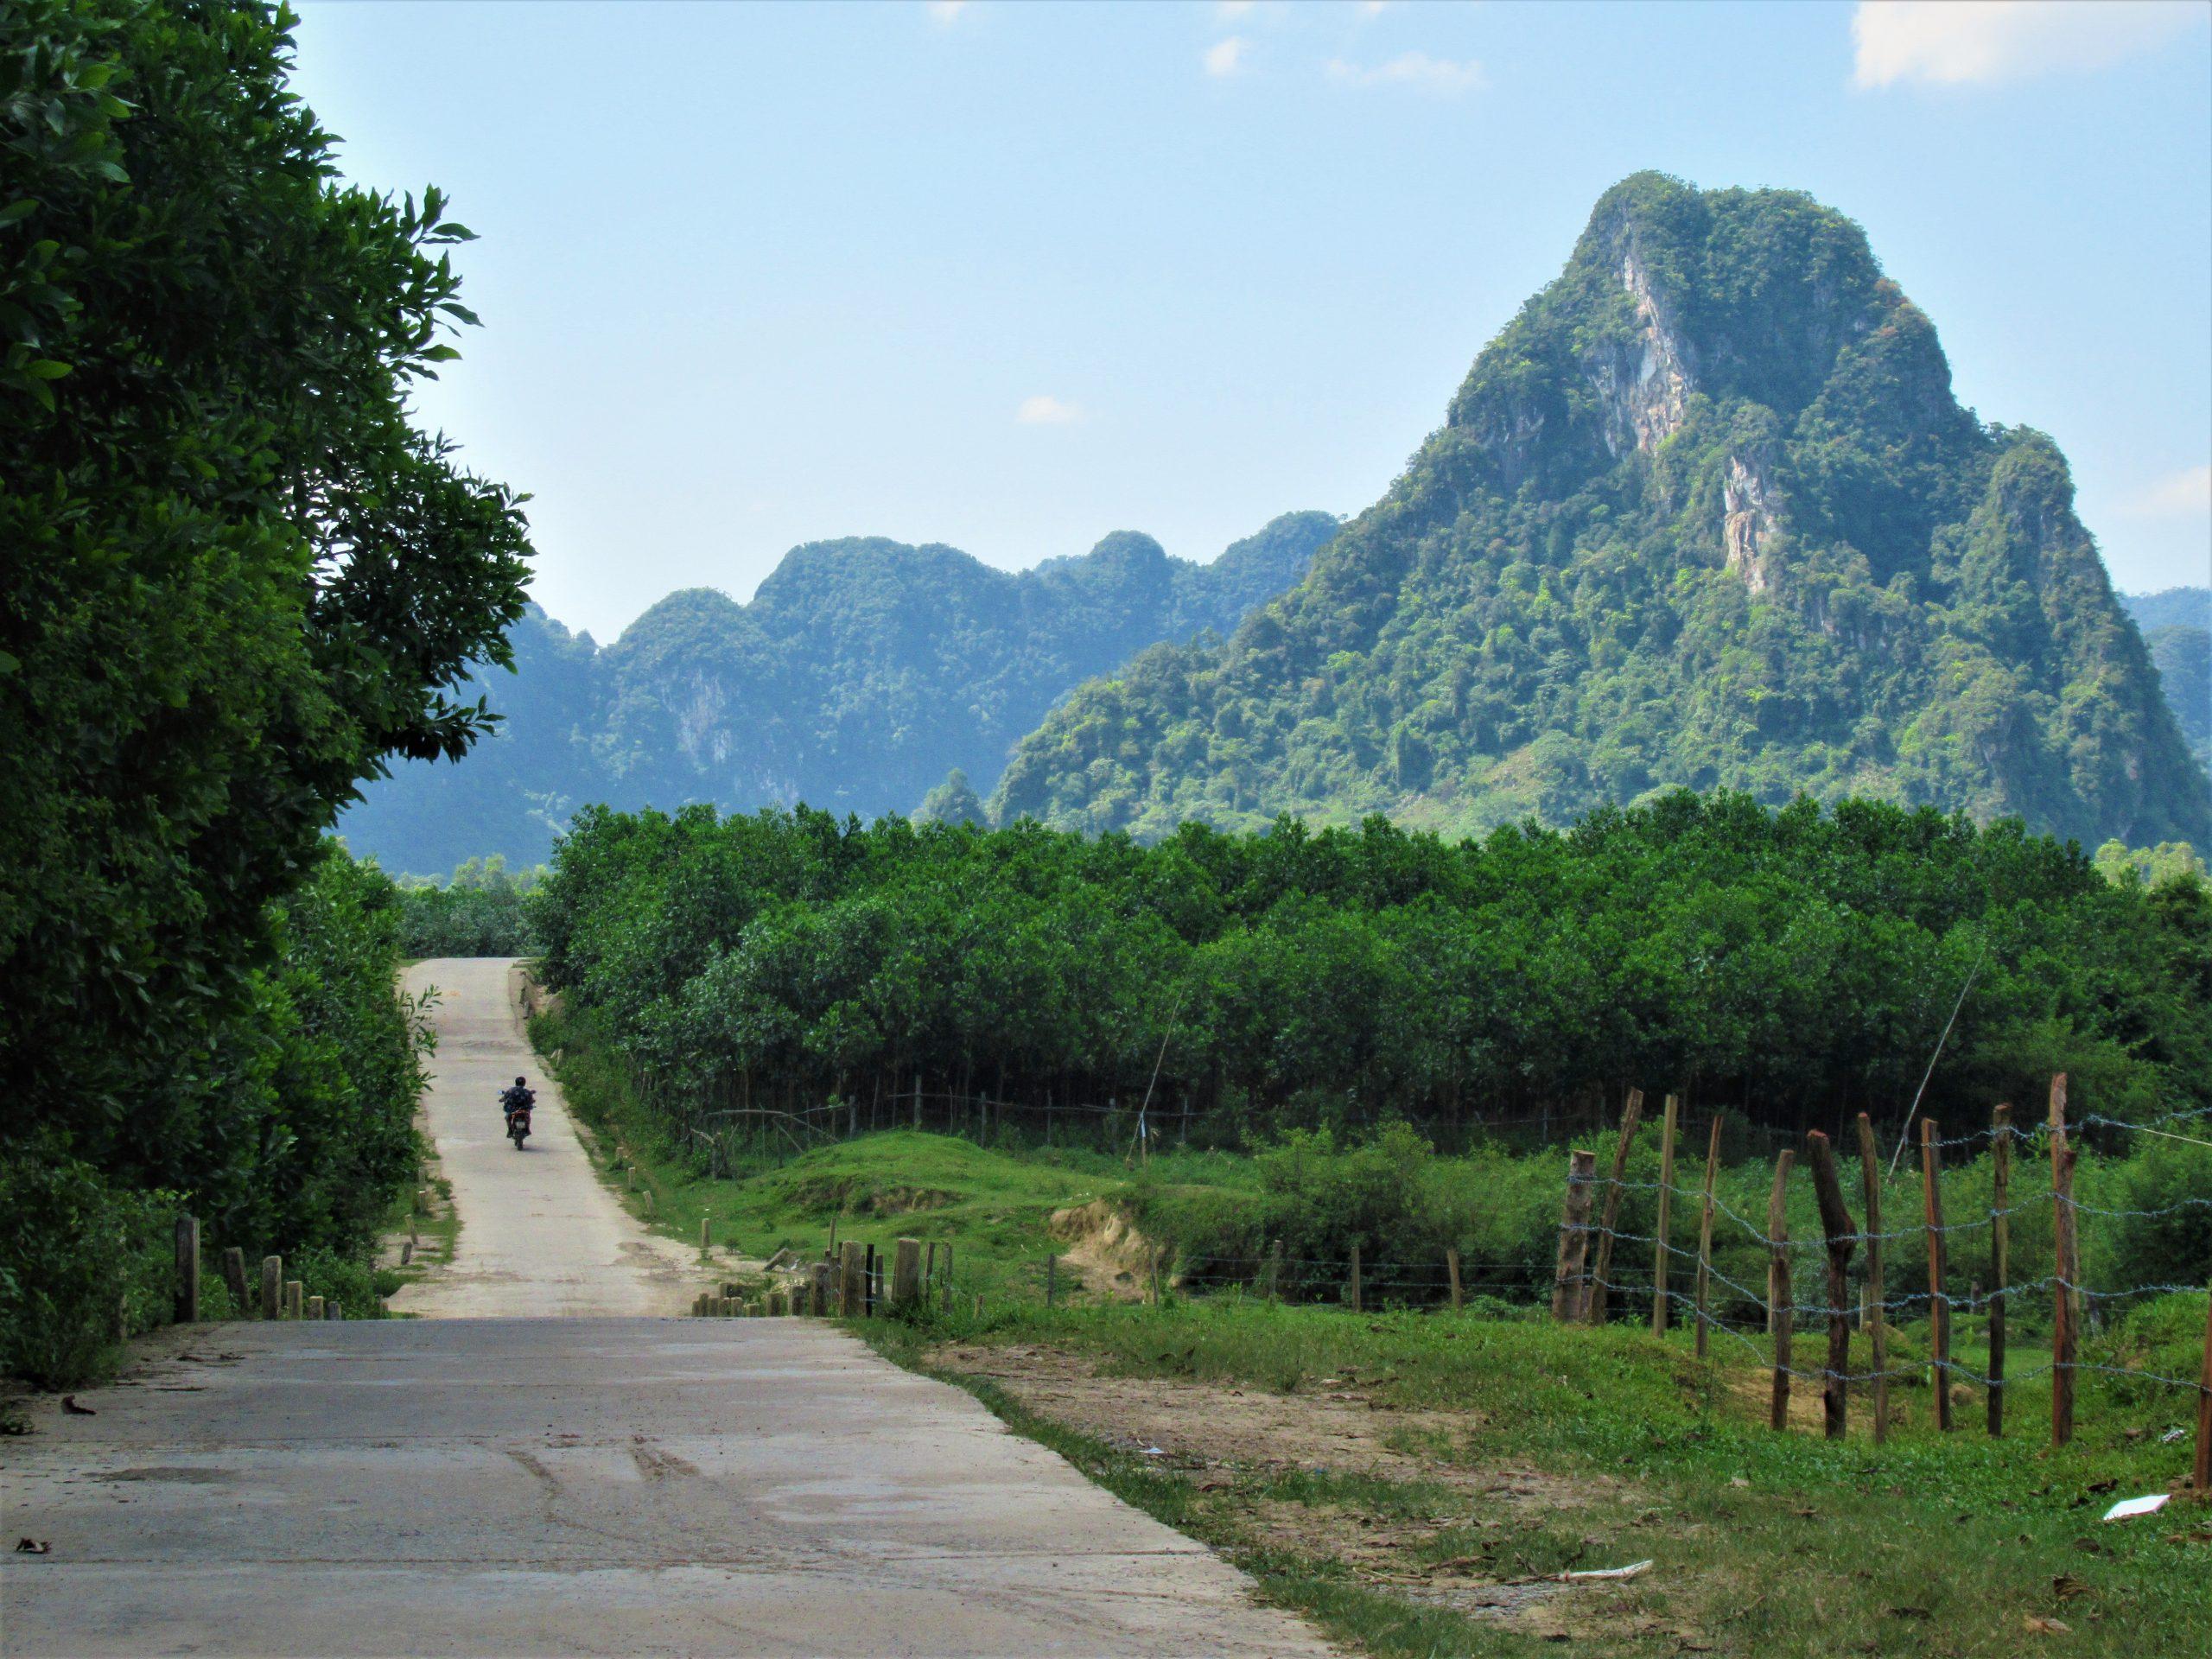 Riding into the limestone karsts on the King Kong Loop, Phong Nha, Central Vietnam